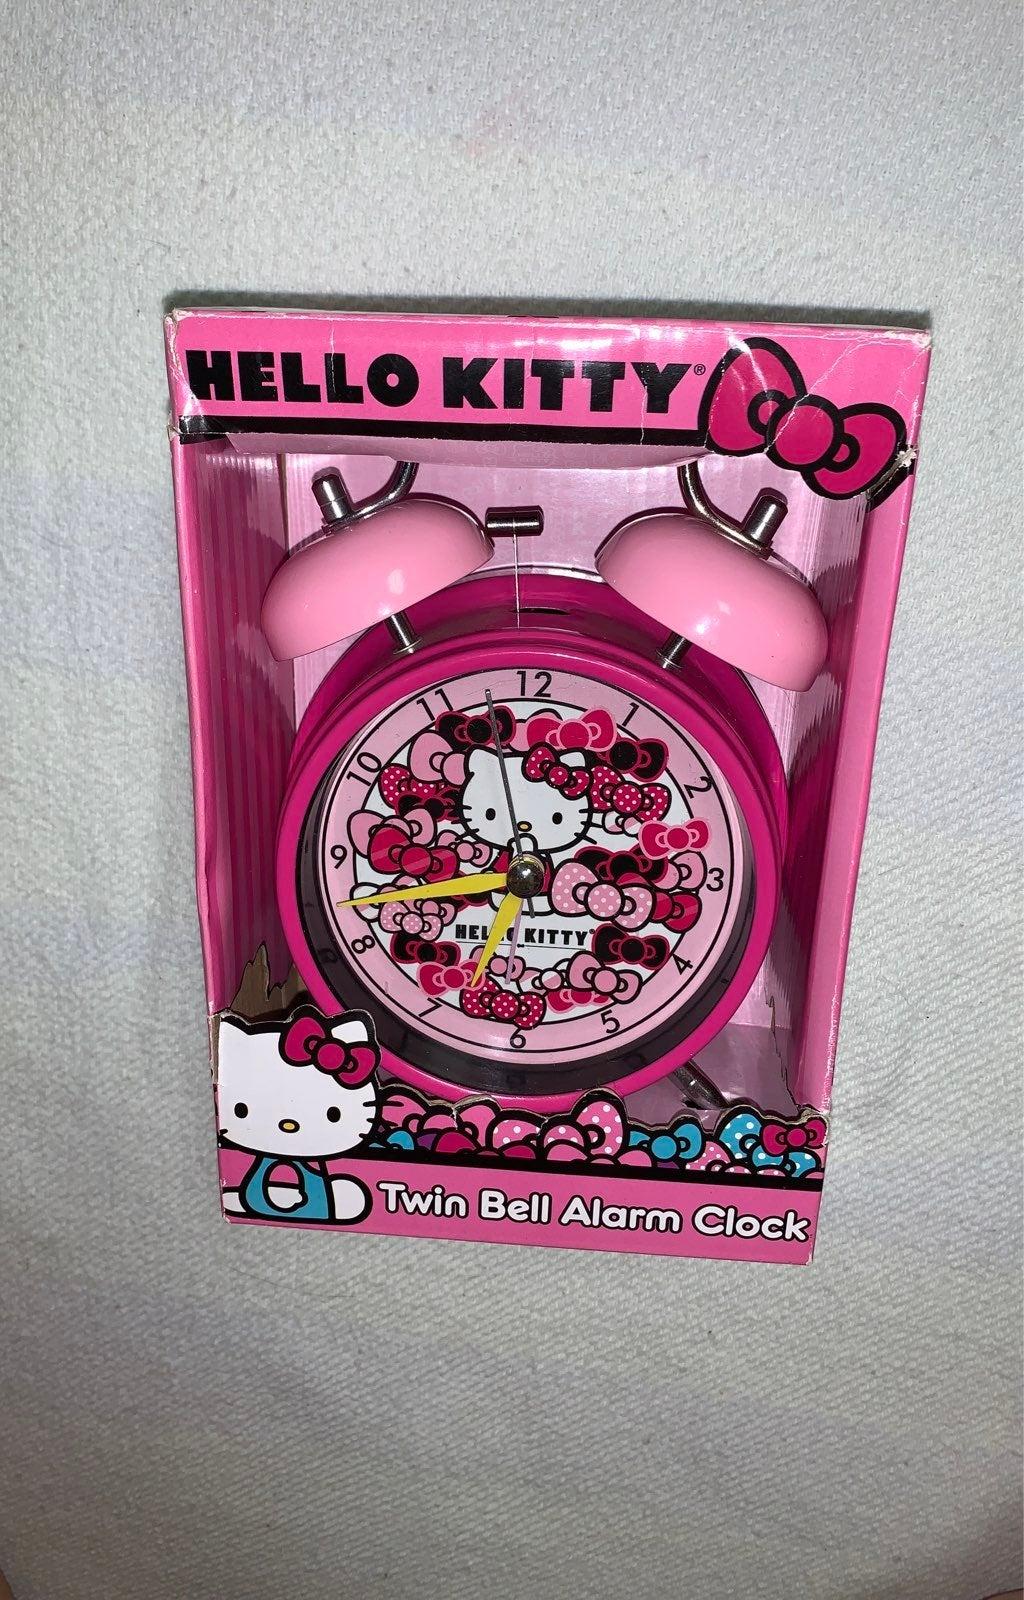 Hello Kitty Twin Bell Alarm Clock New!